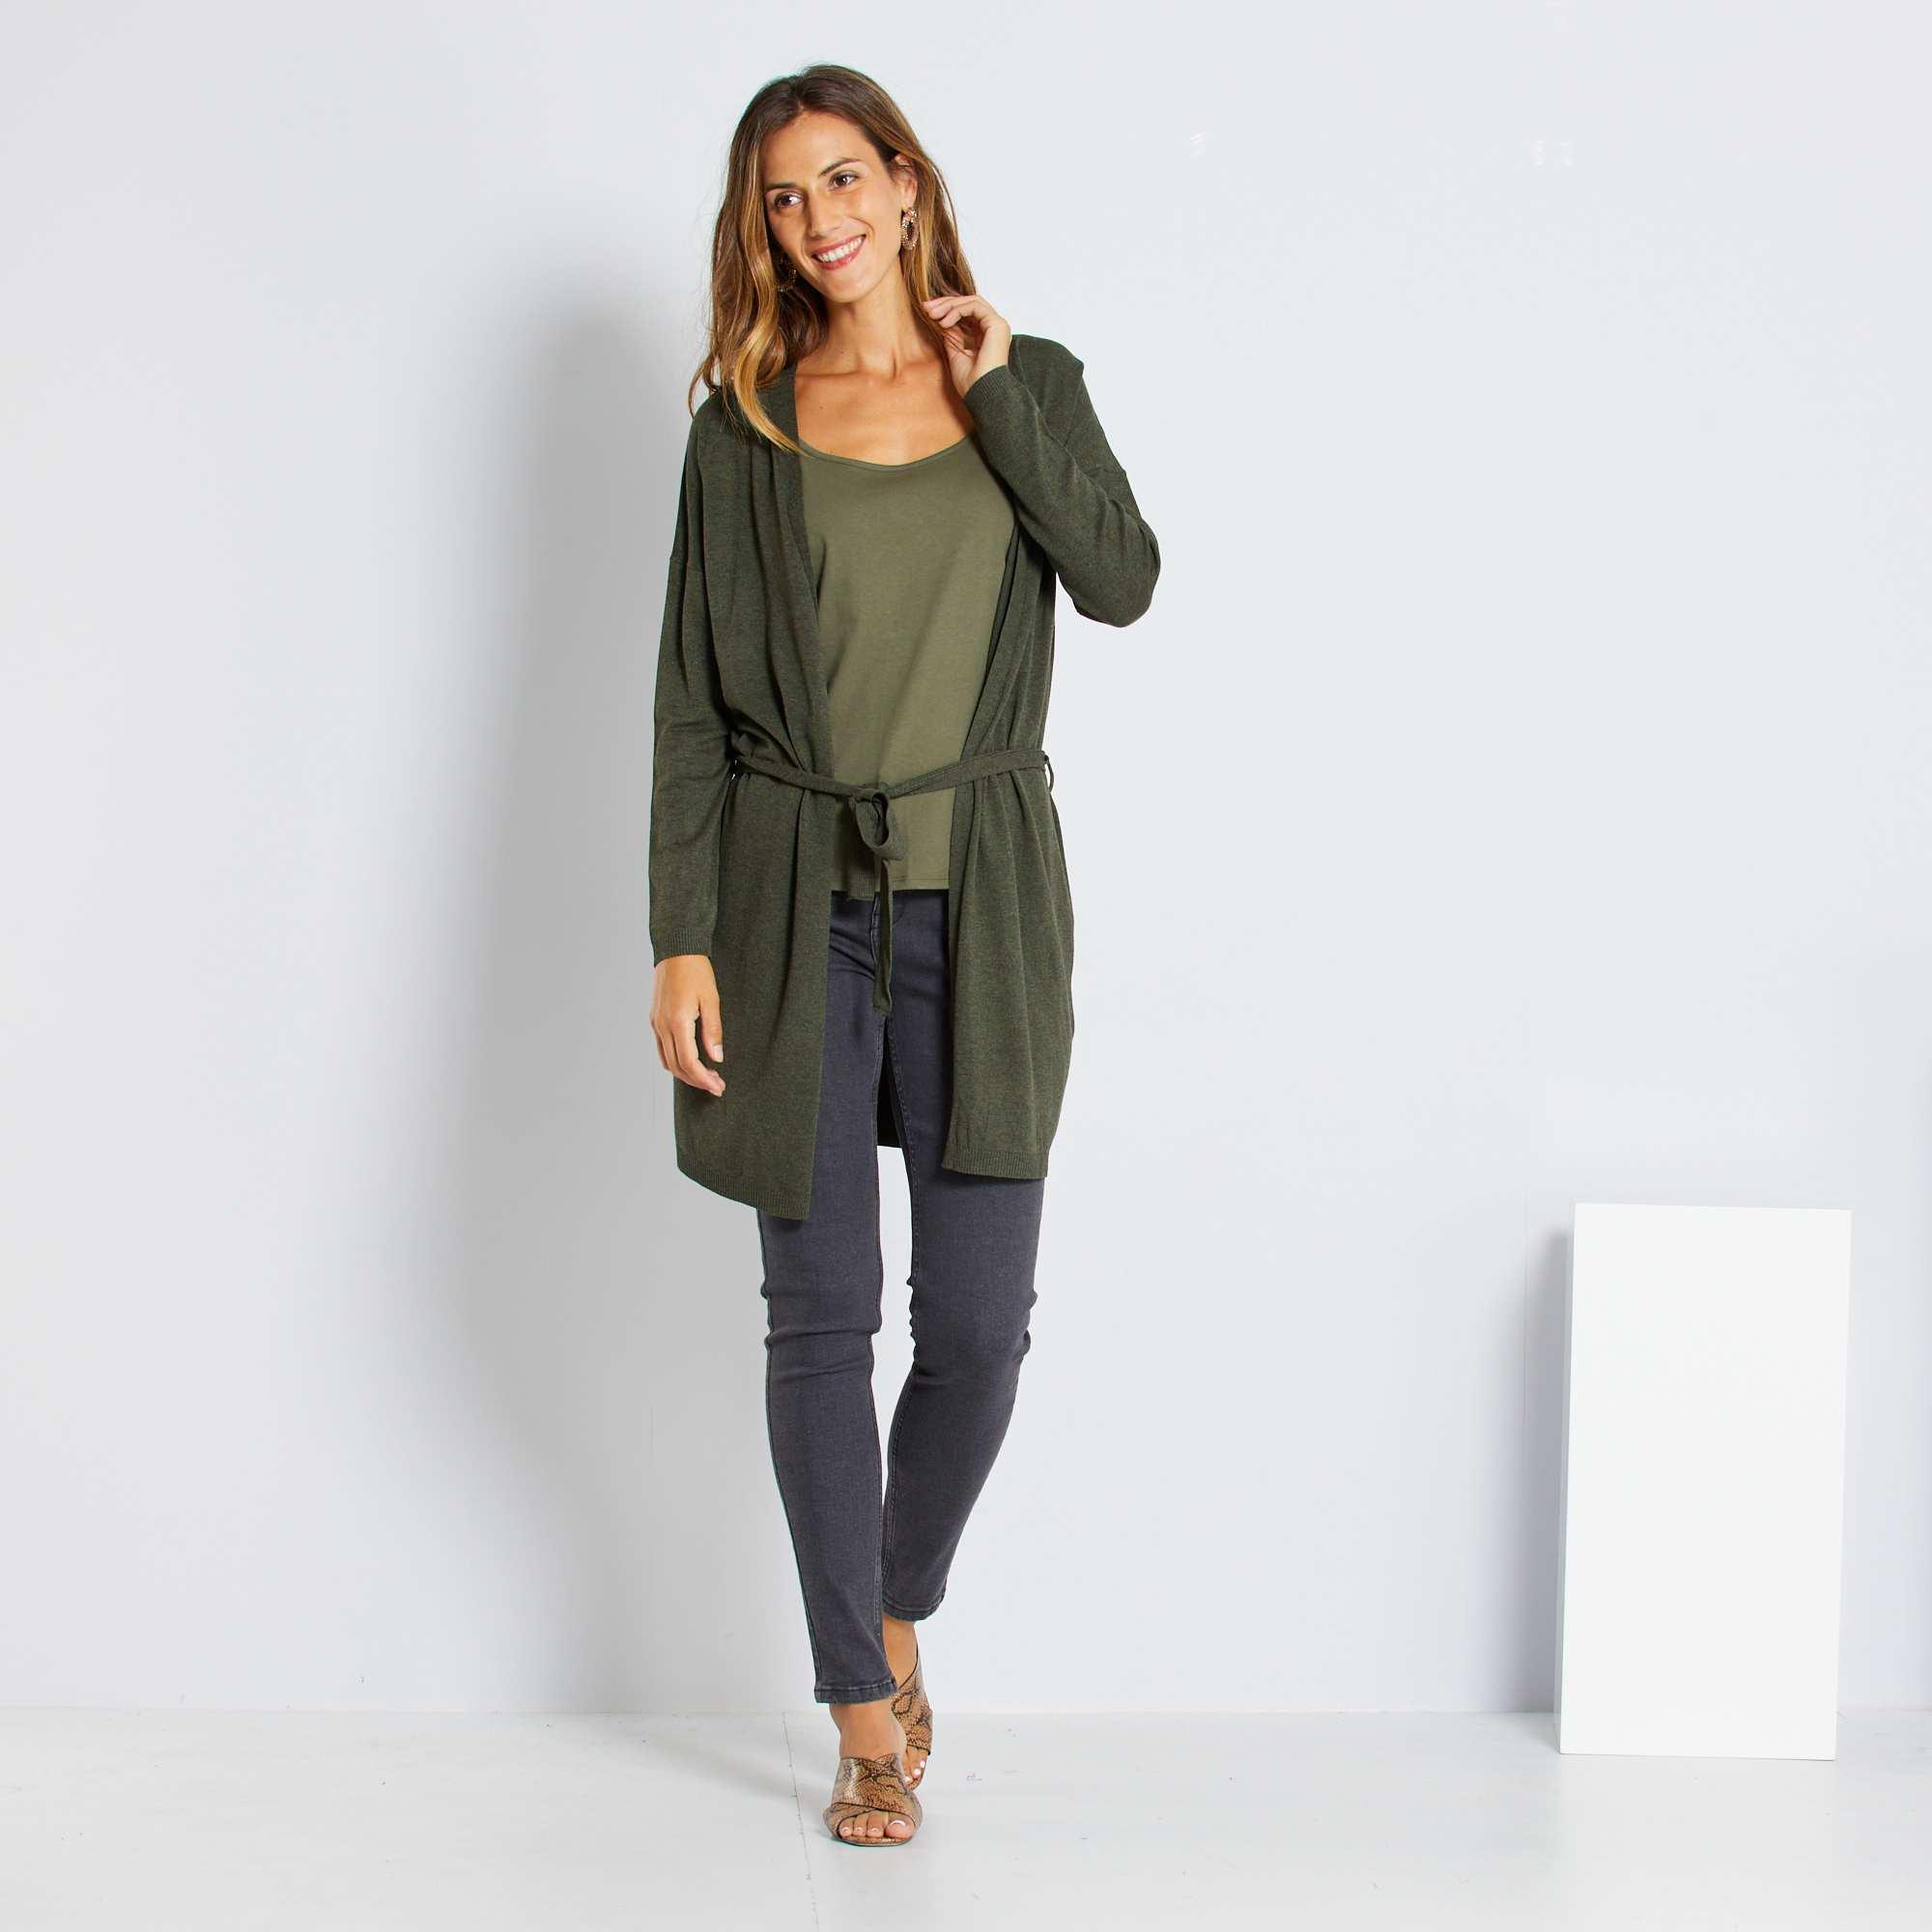 jean skinny taille haute longueur us 30 femme gris fonc. Black Bedroom Furniture Sets. Home Design Ideas